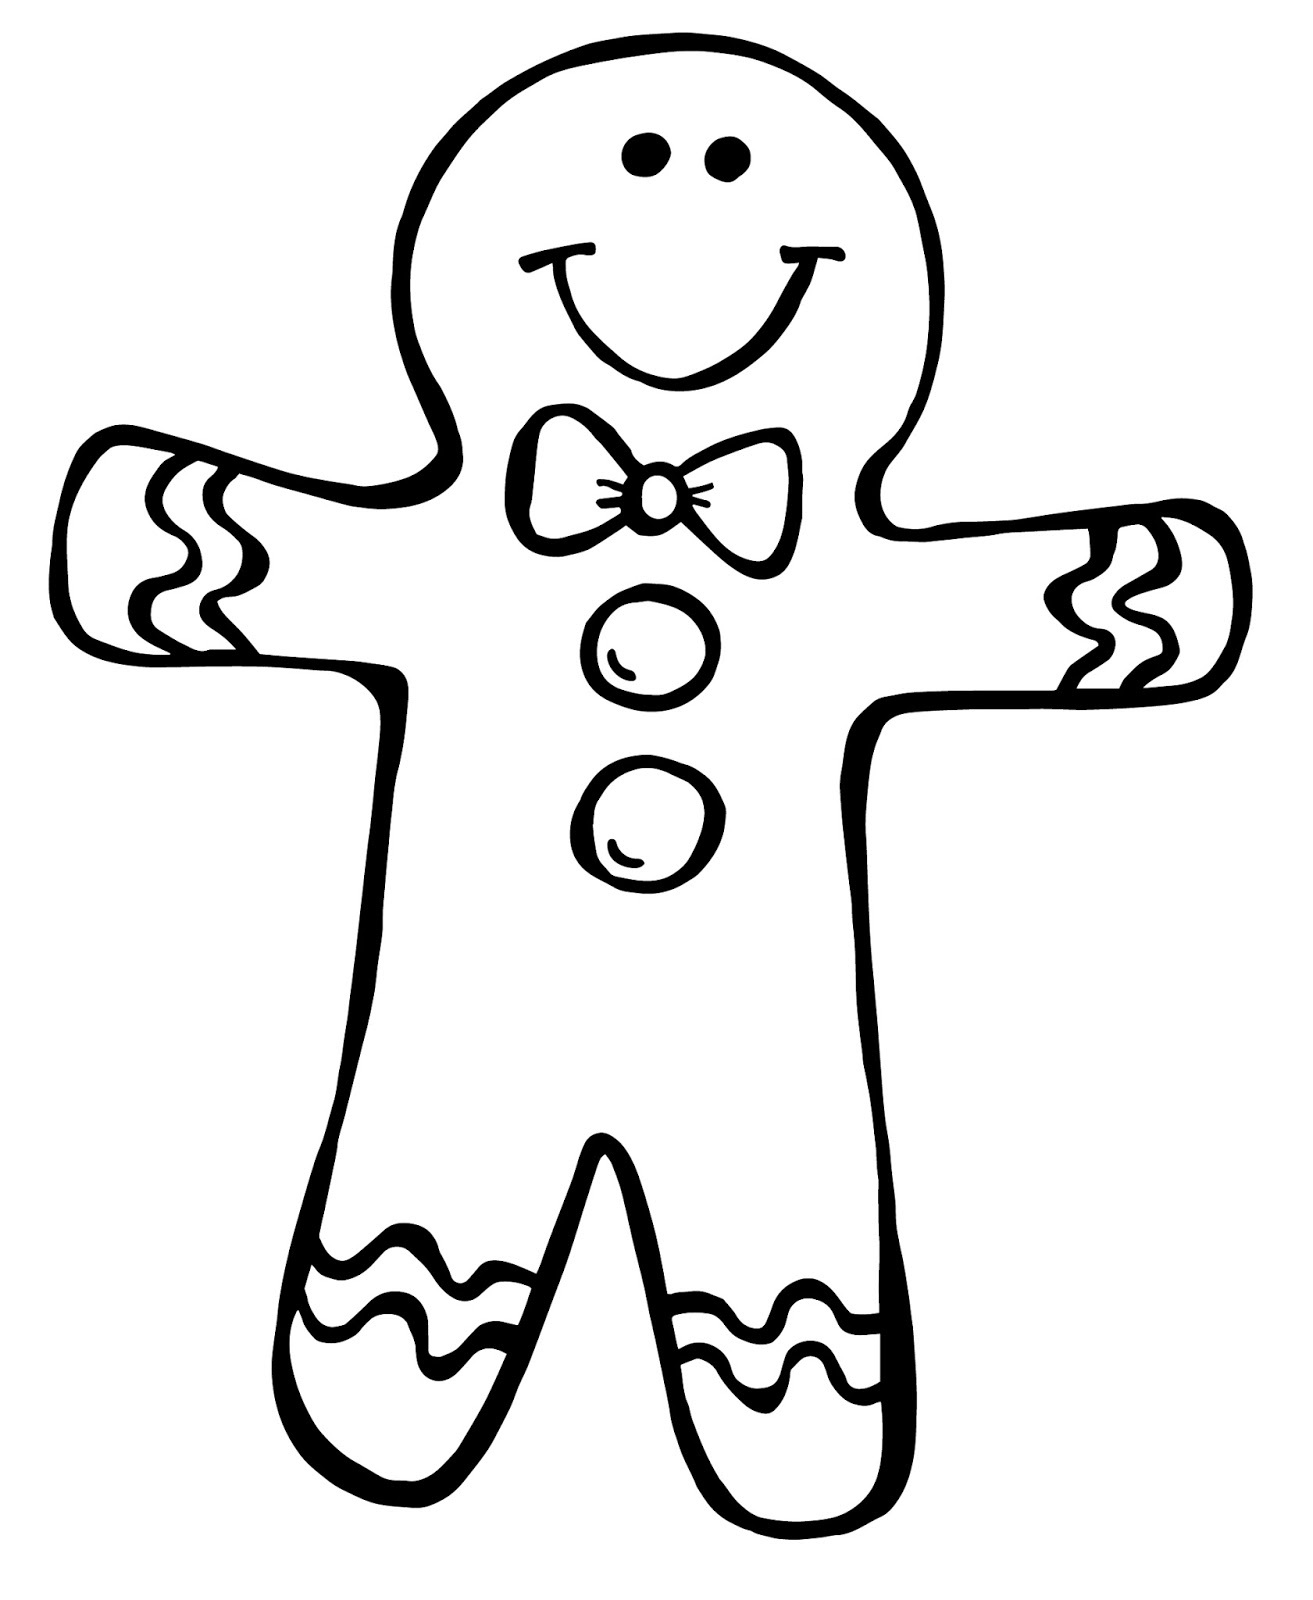 Black & White clipart gingerbread Men web com clipartix man